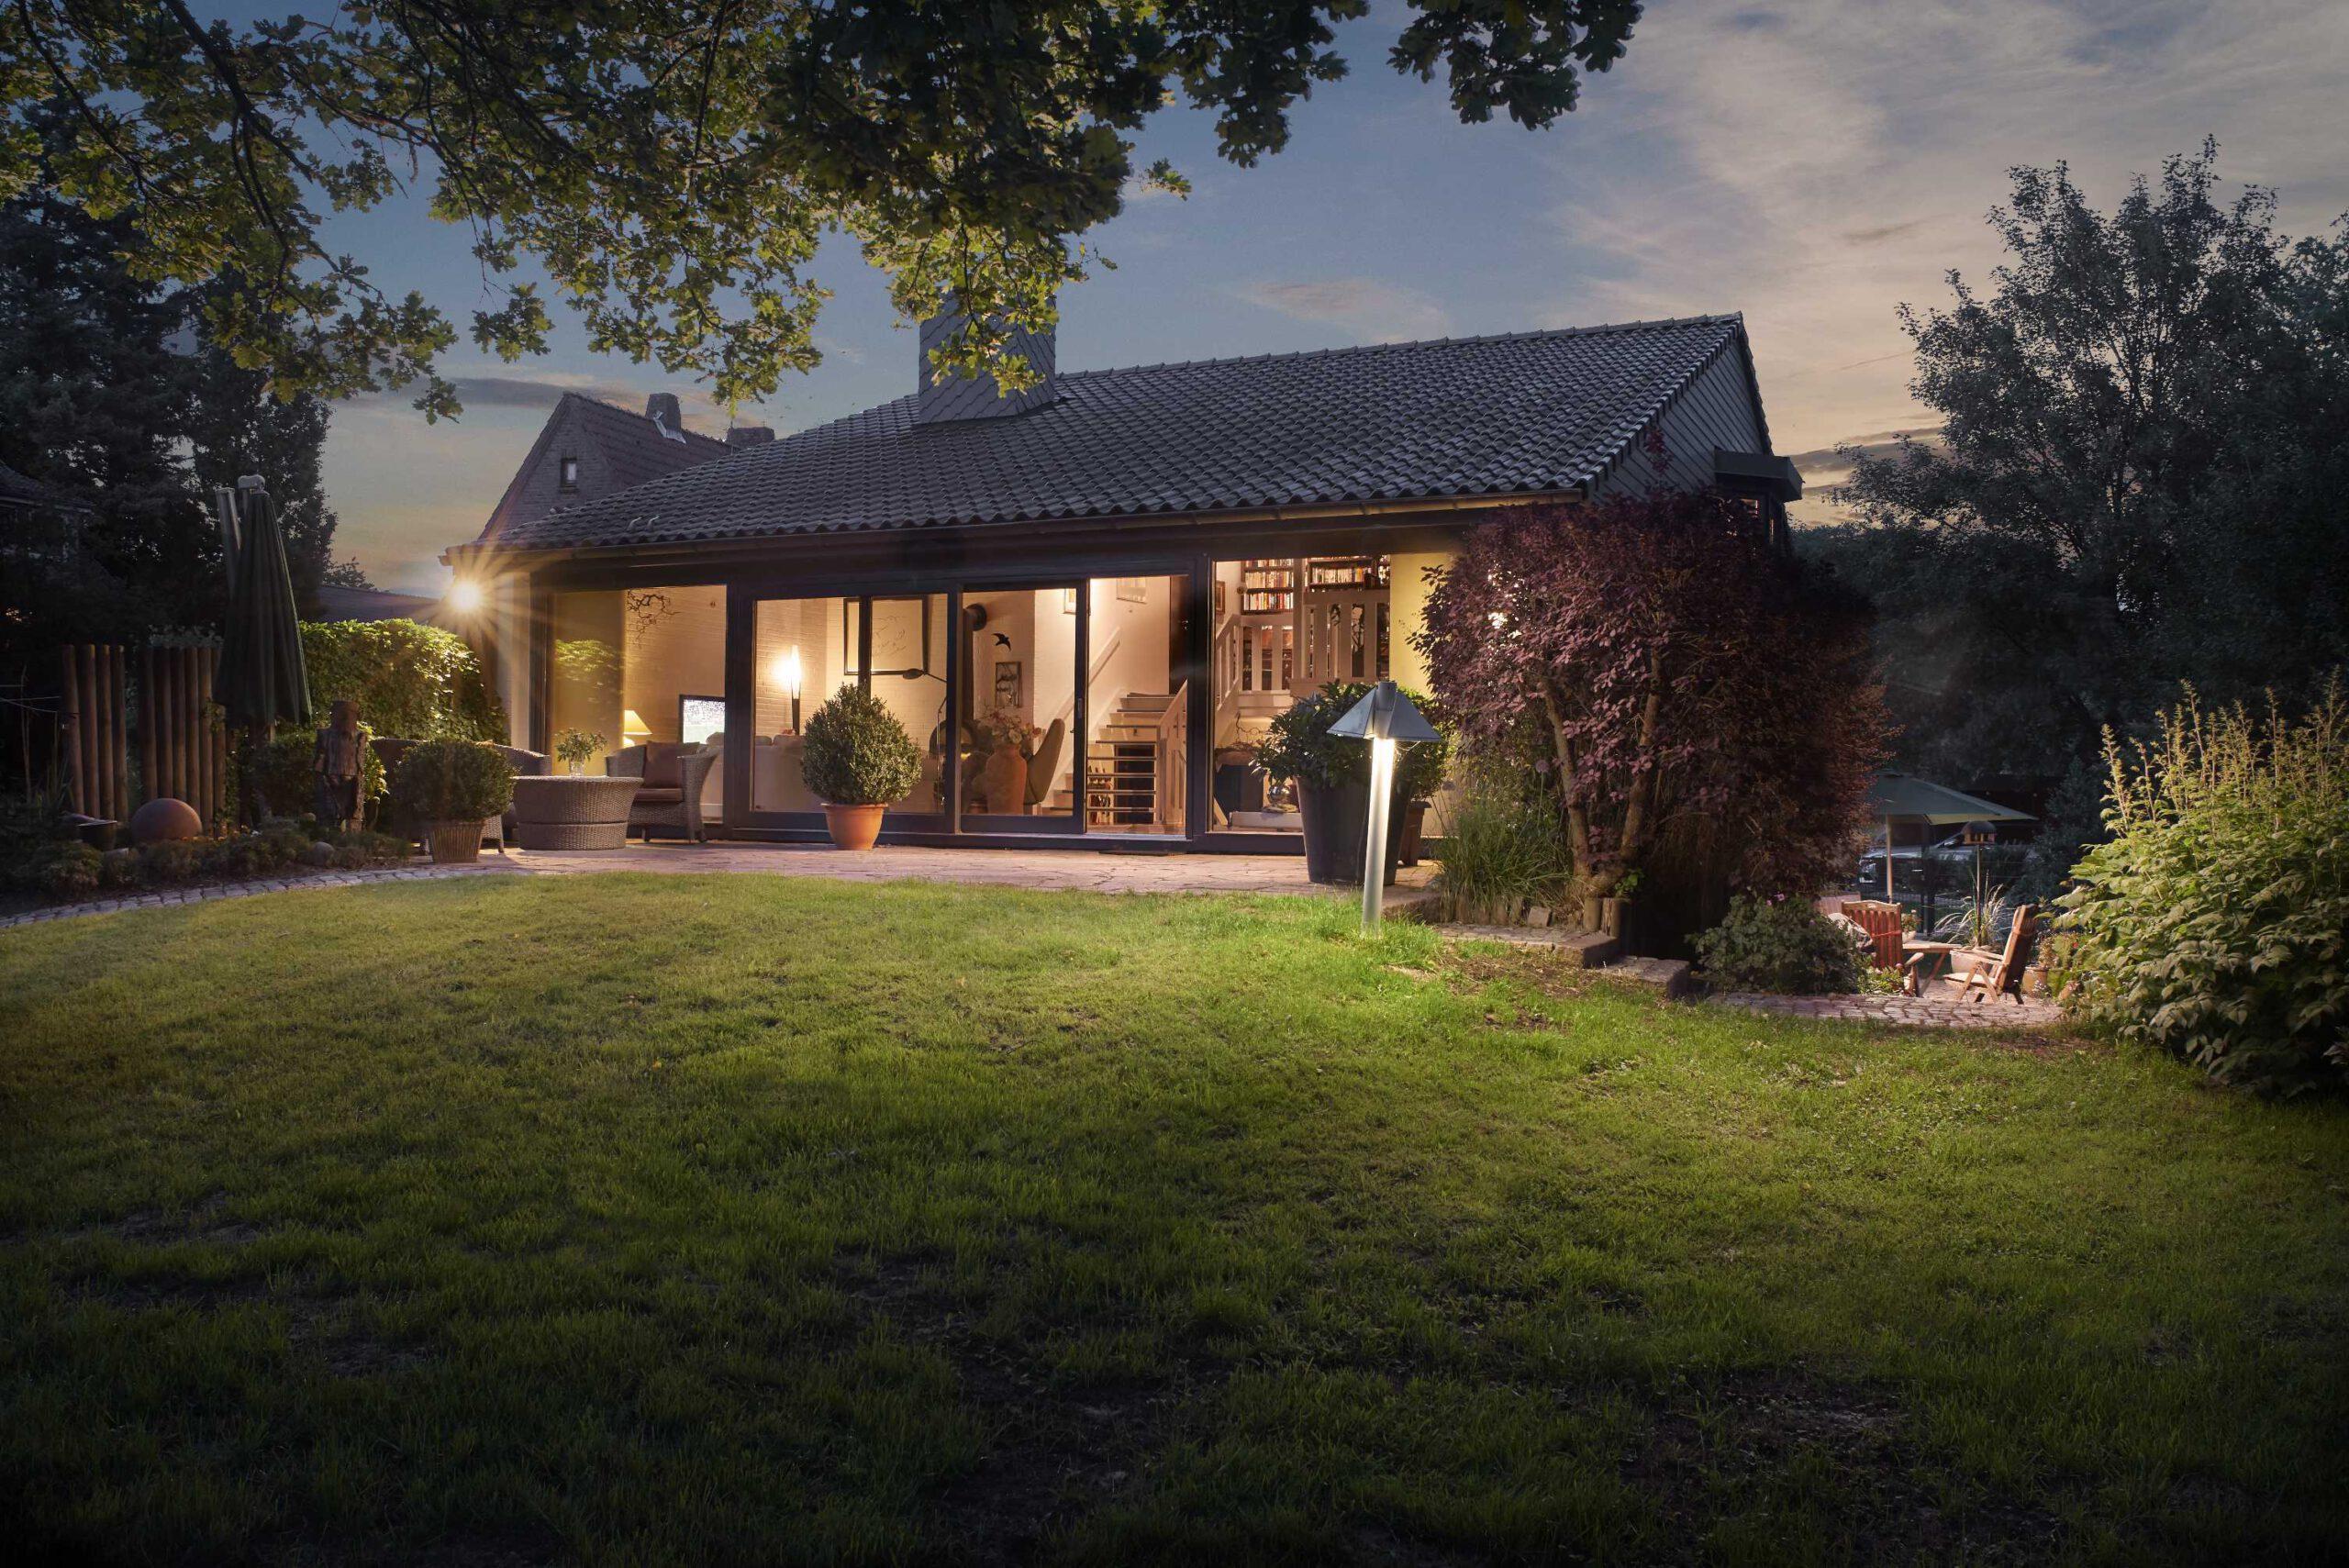 Einfamilienhaus-Rosengarten